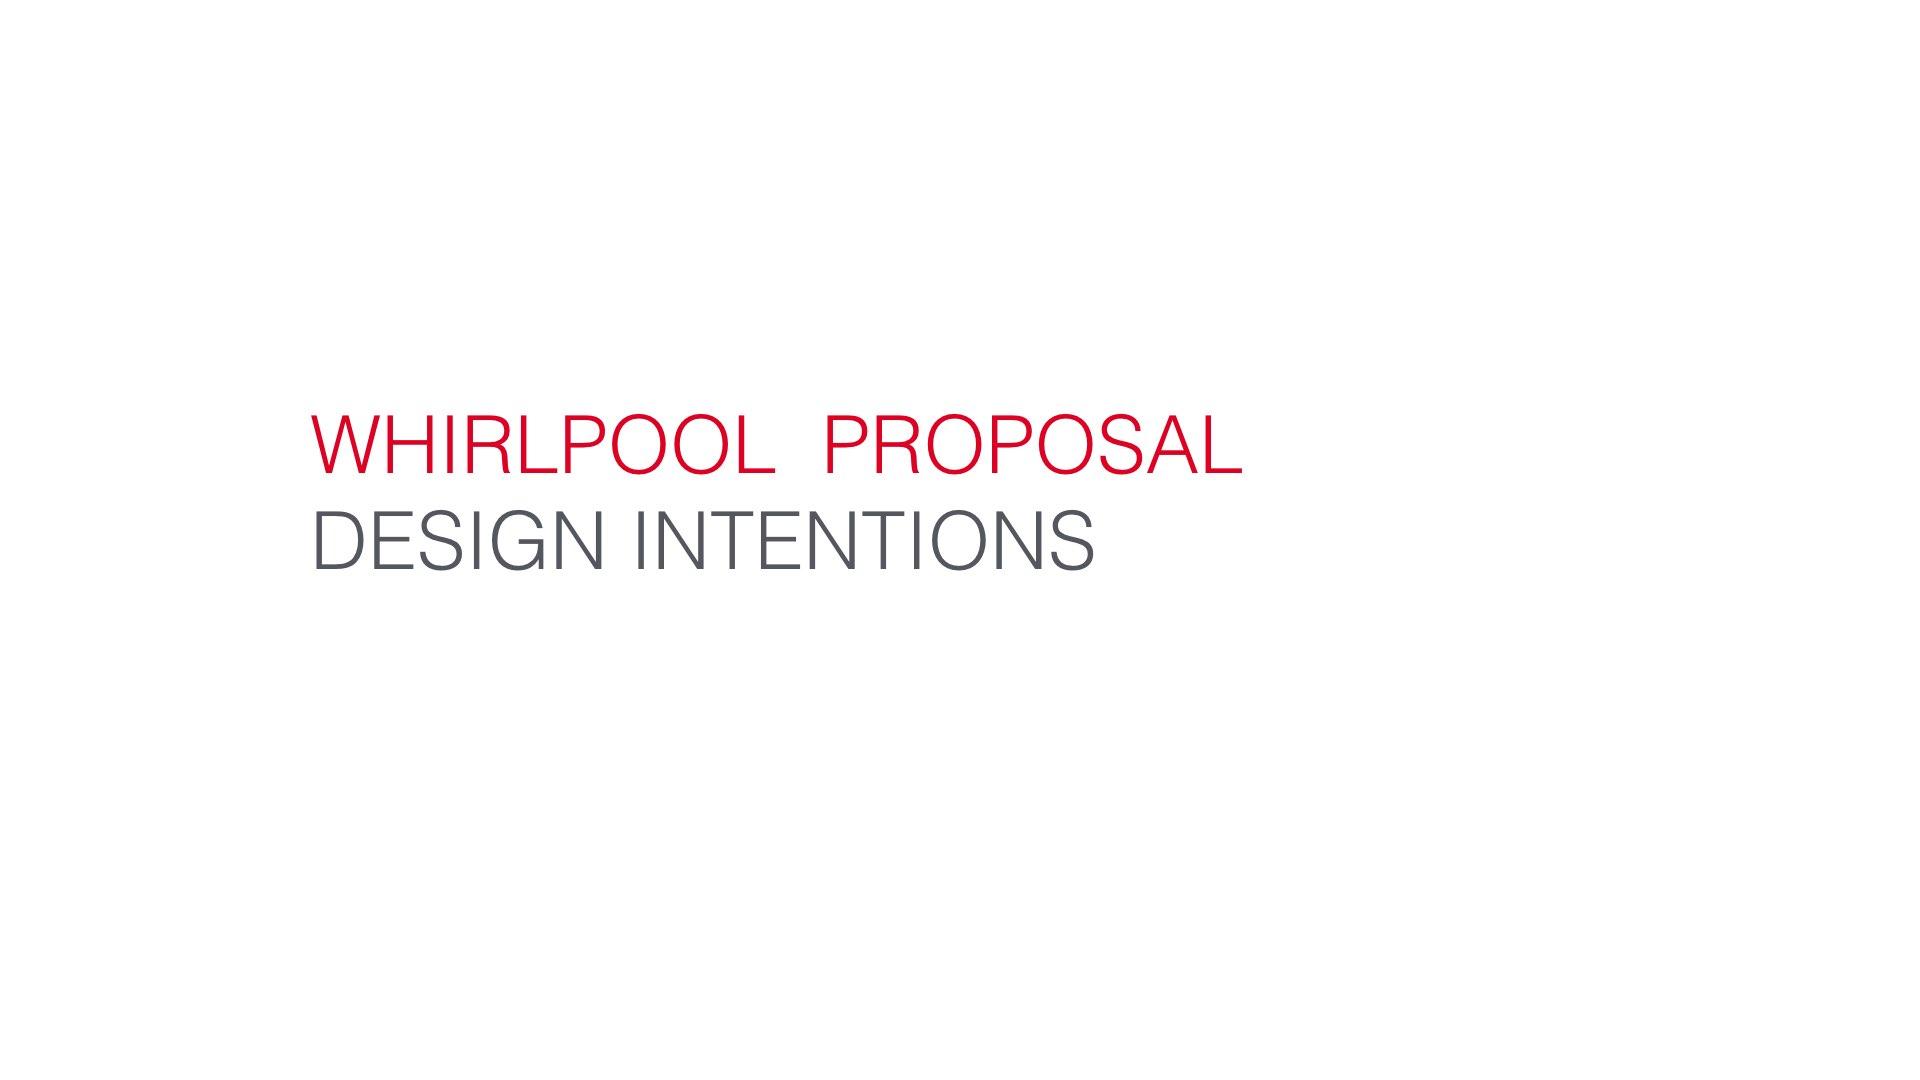 whirlpool_proposal.001.jpeg